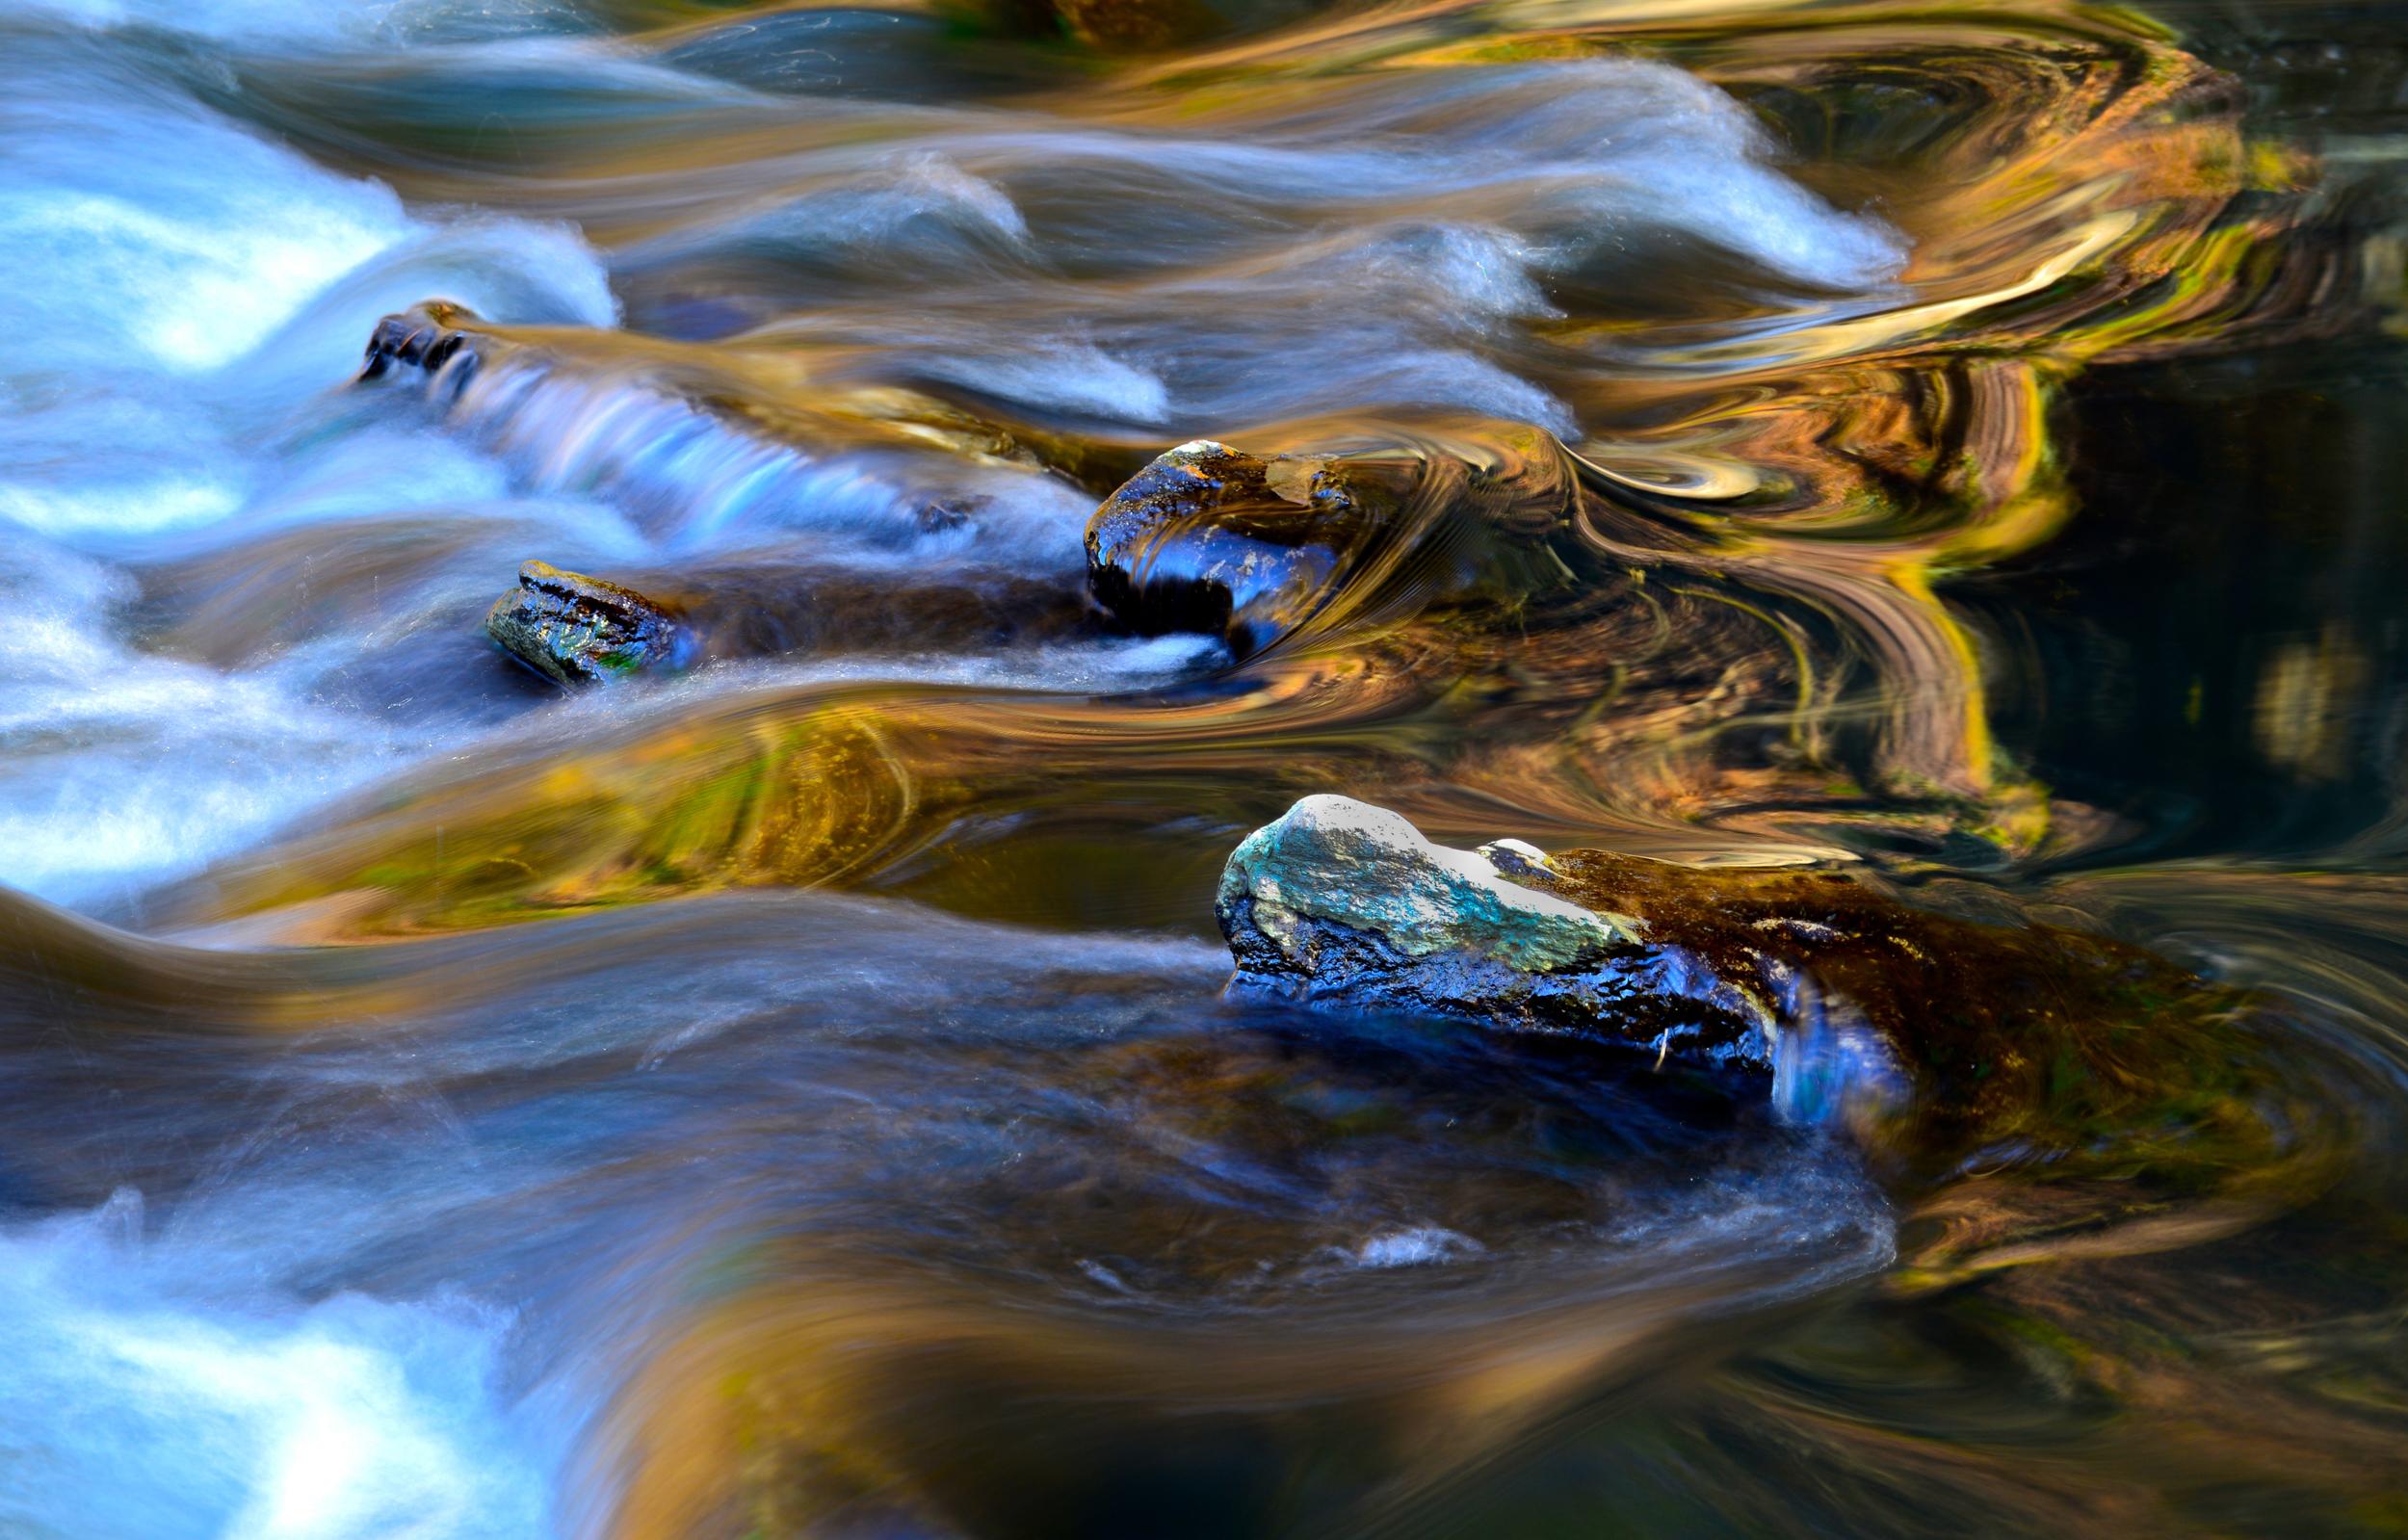 Water bends around the rocks in Wissahickon creek, Philadelphia.